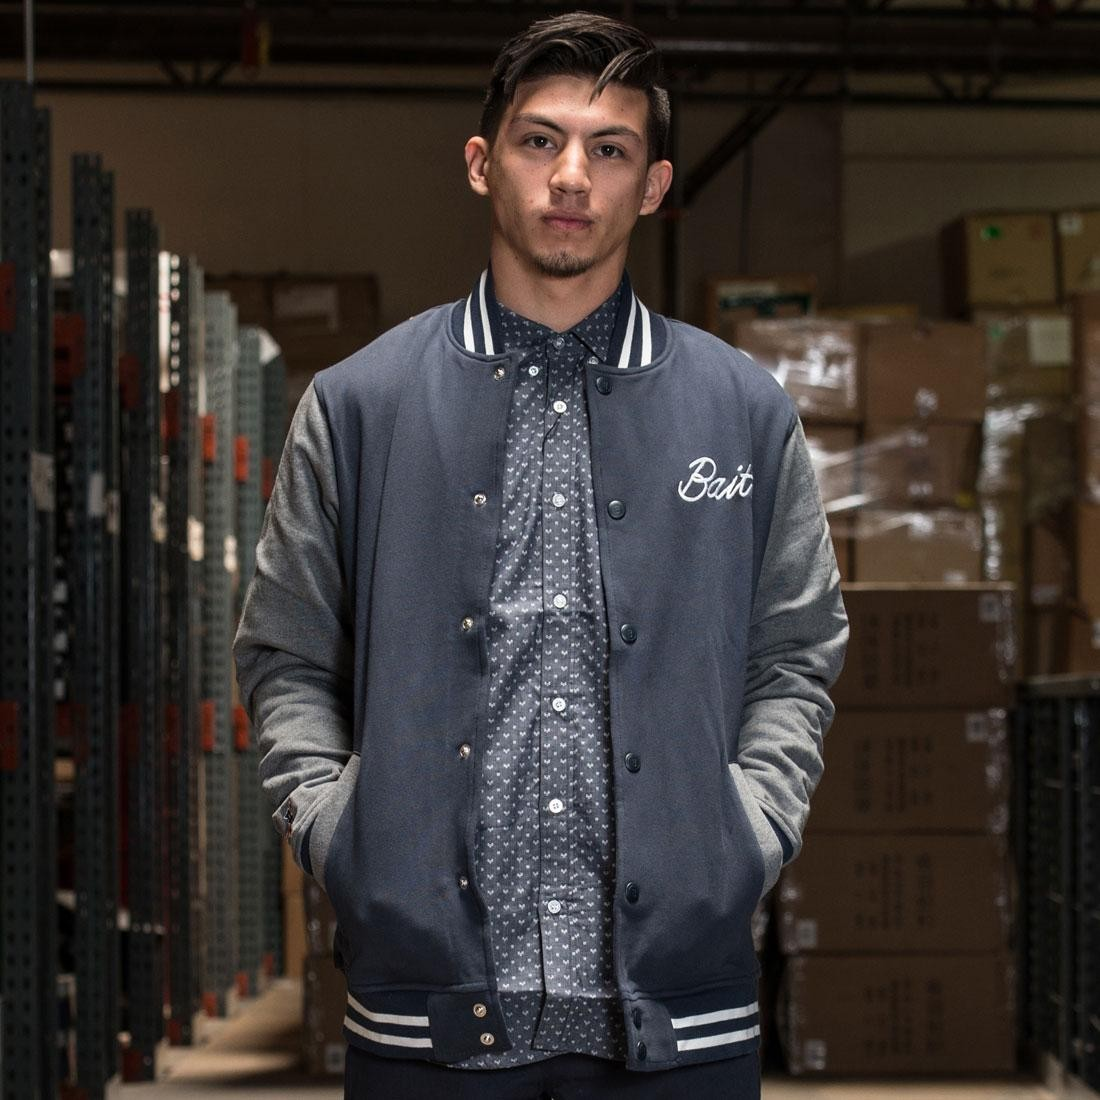 BAIT Basics Baseball Jacket (navy / grey)